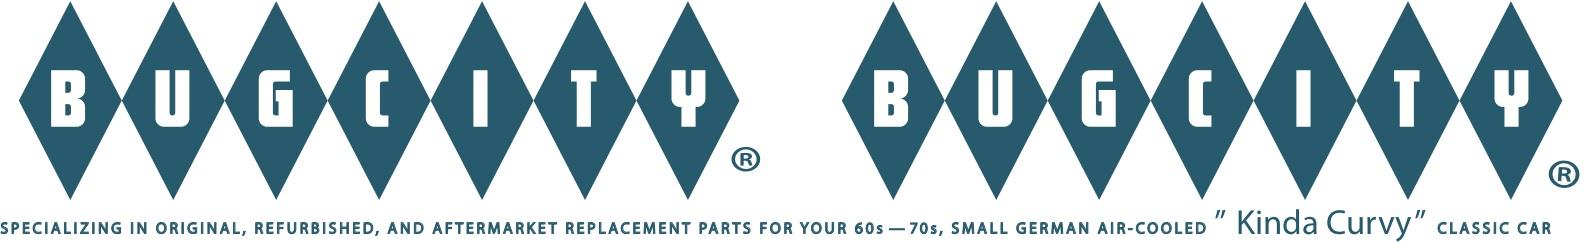 Classic Vintage VW ® Parts - New, Used Original, Refurbished